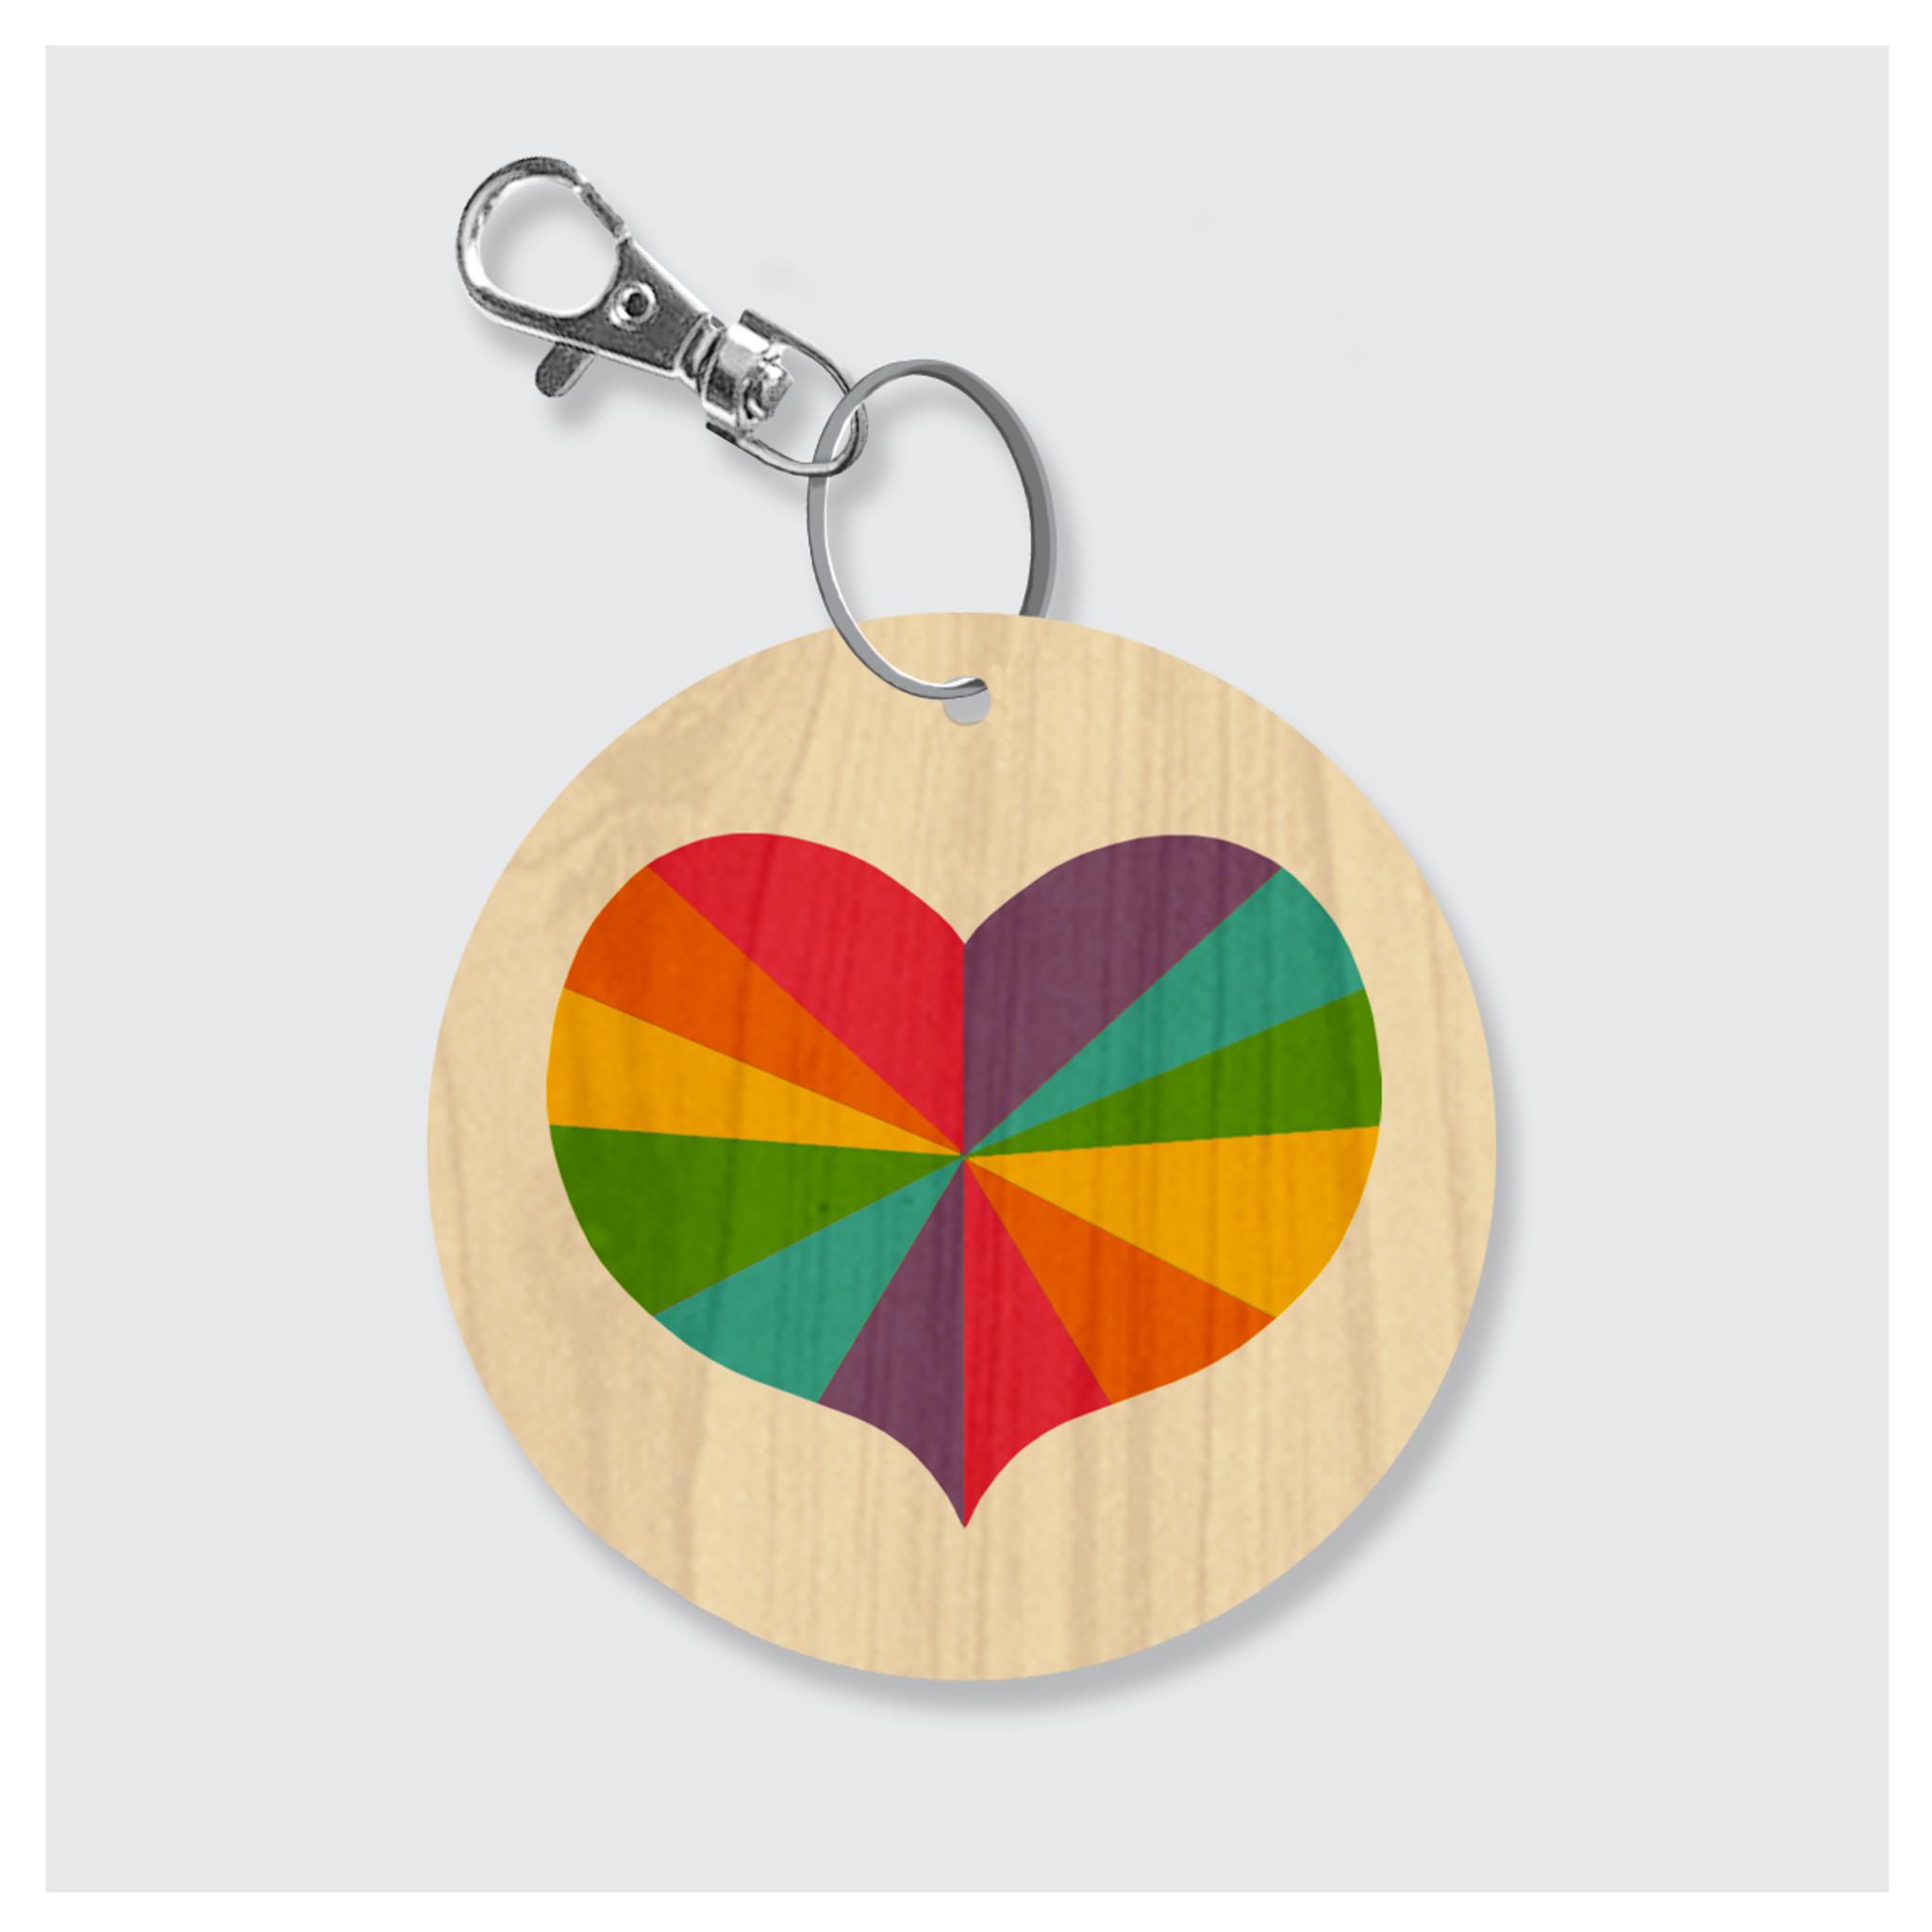 Colorful Heart Keychain